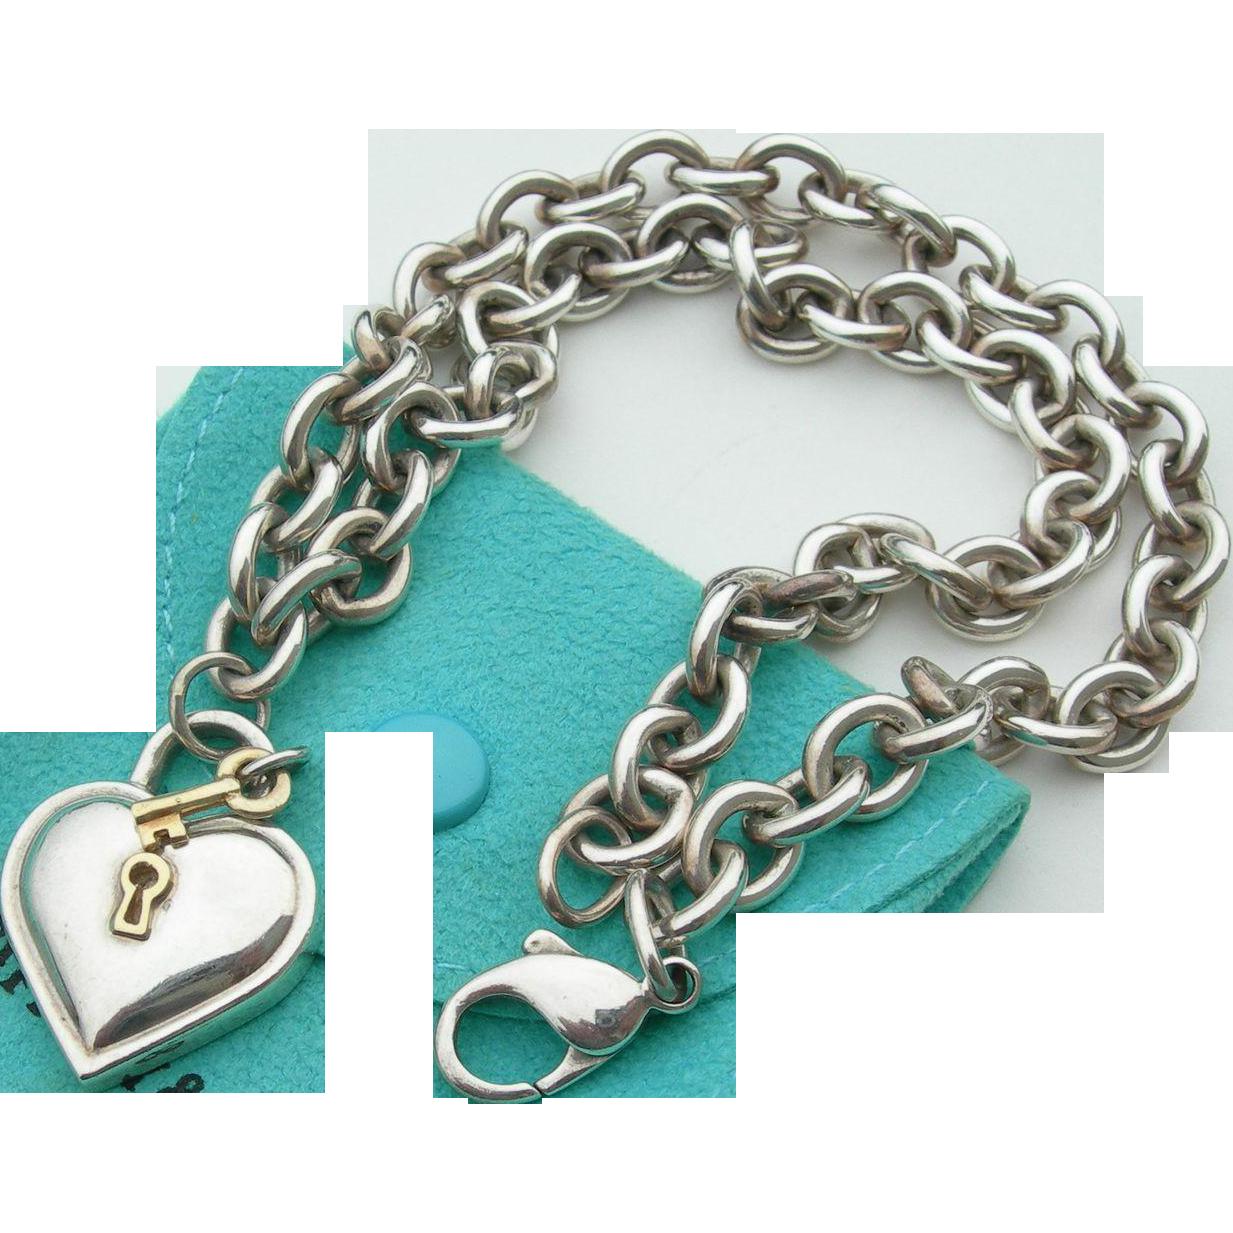 Tiffany & Co - Sterling & 18K - Padlock Heart & Key Necklace w/Pouch